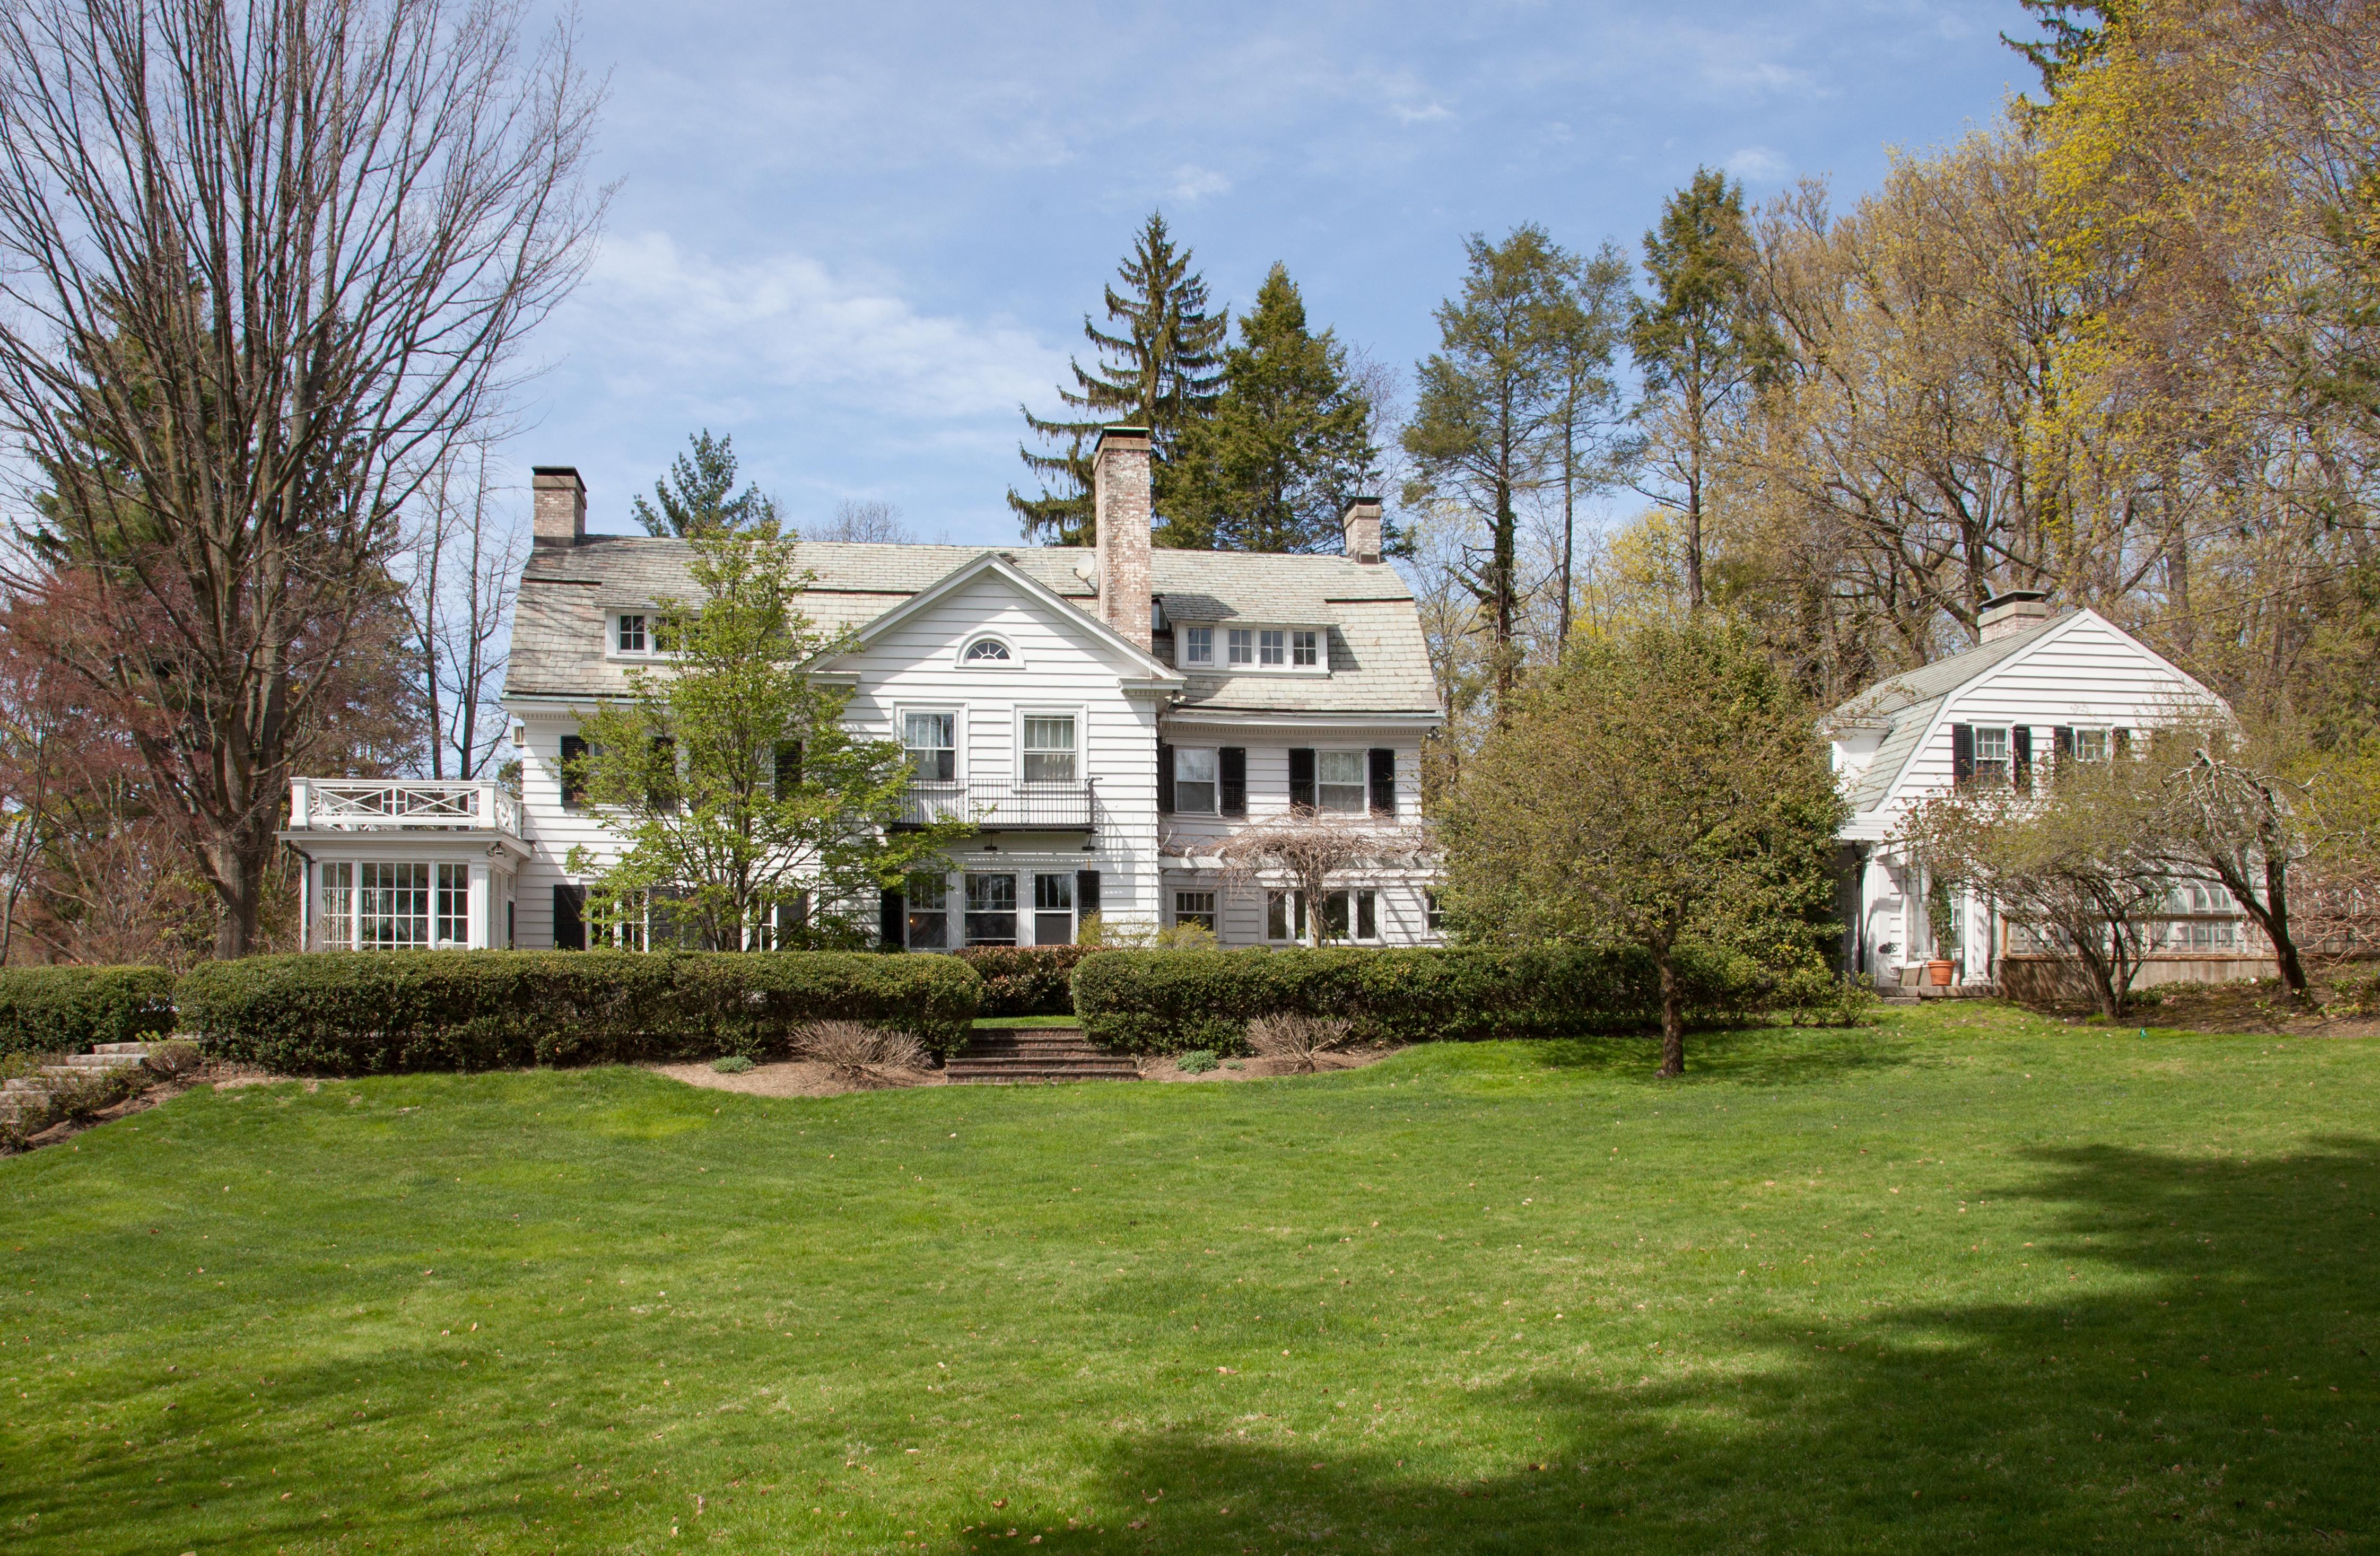 Single Family Home for Sale at Hudson River Estate 14 Washington Avenue Irvington, New York 10533 United States